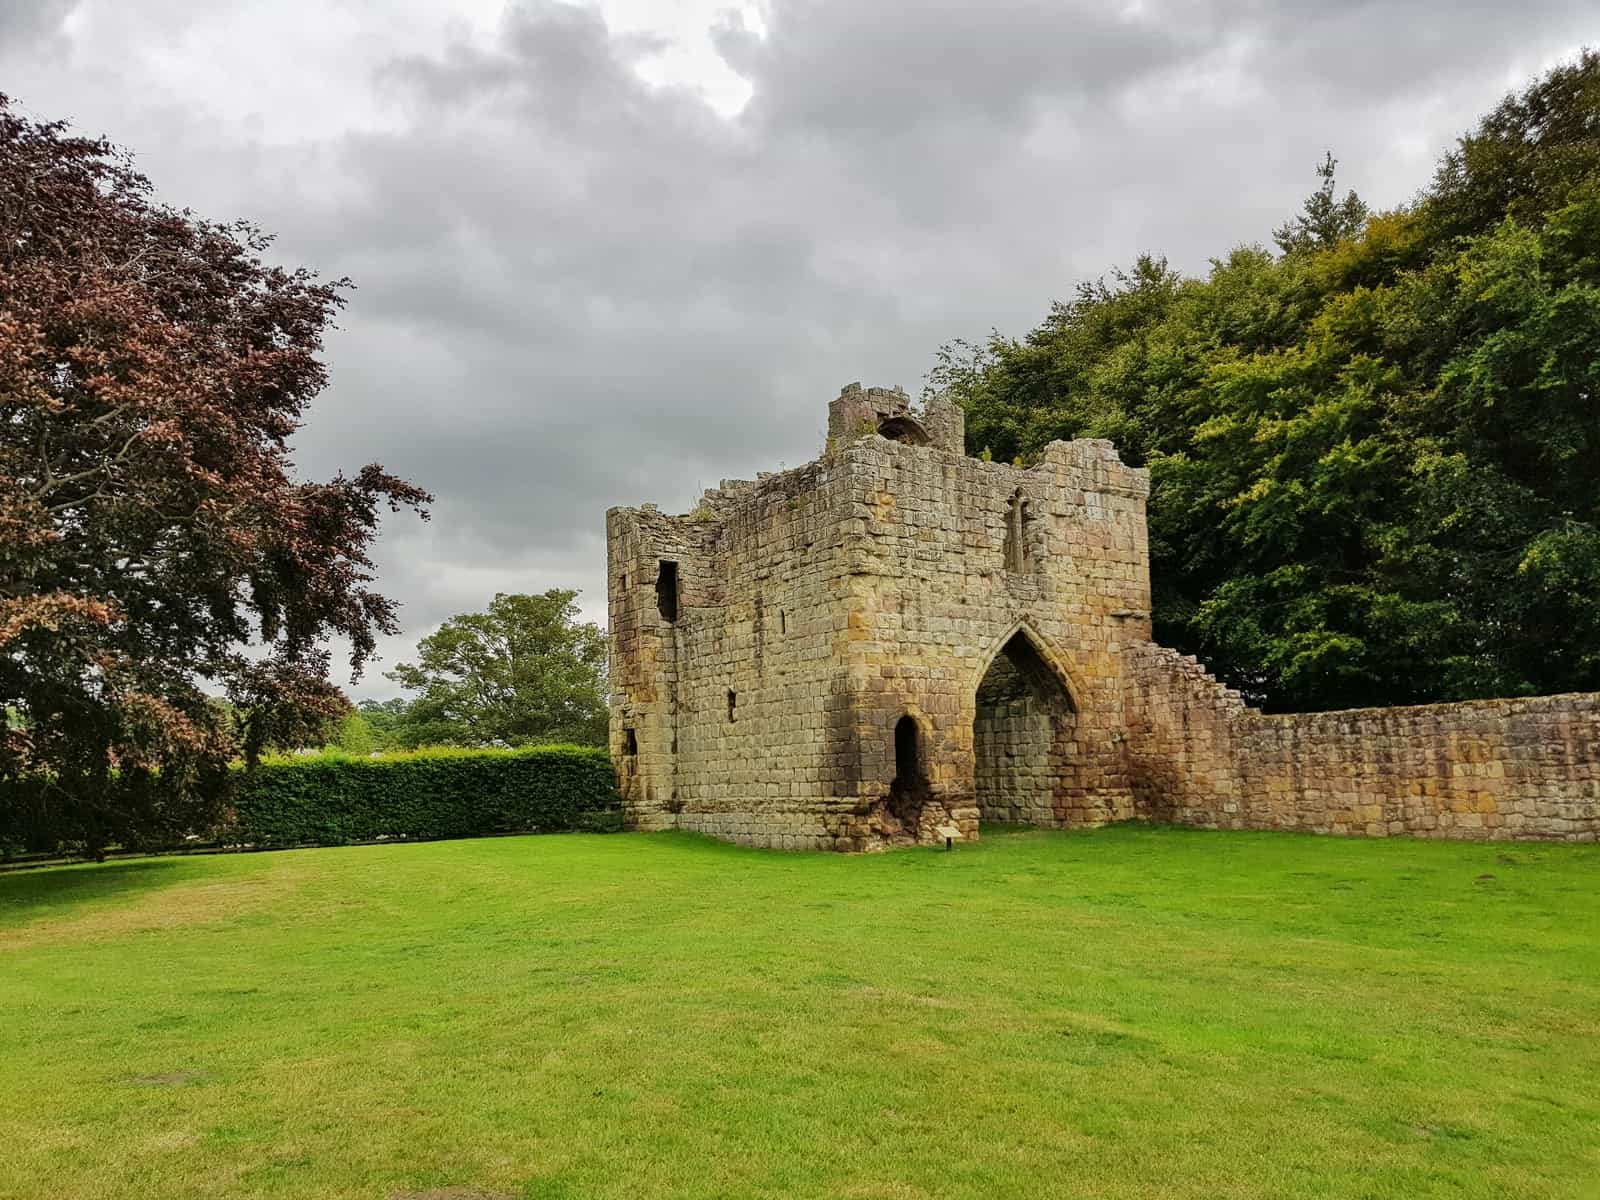 Ford and Etal Castle gatehouse